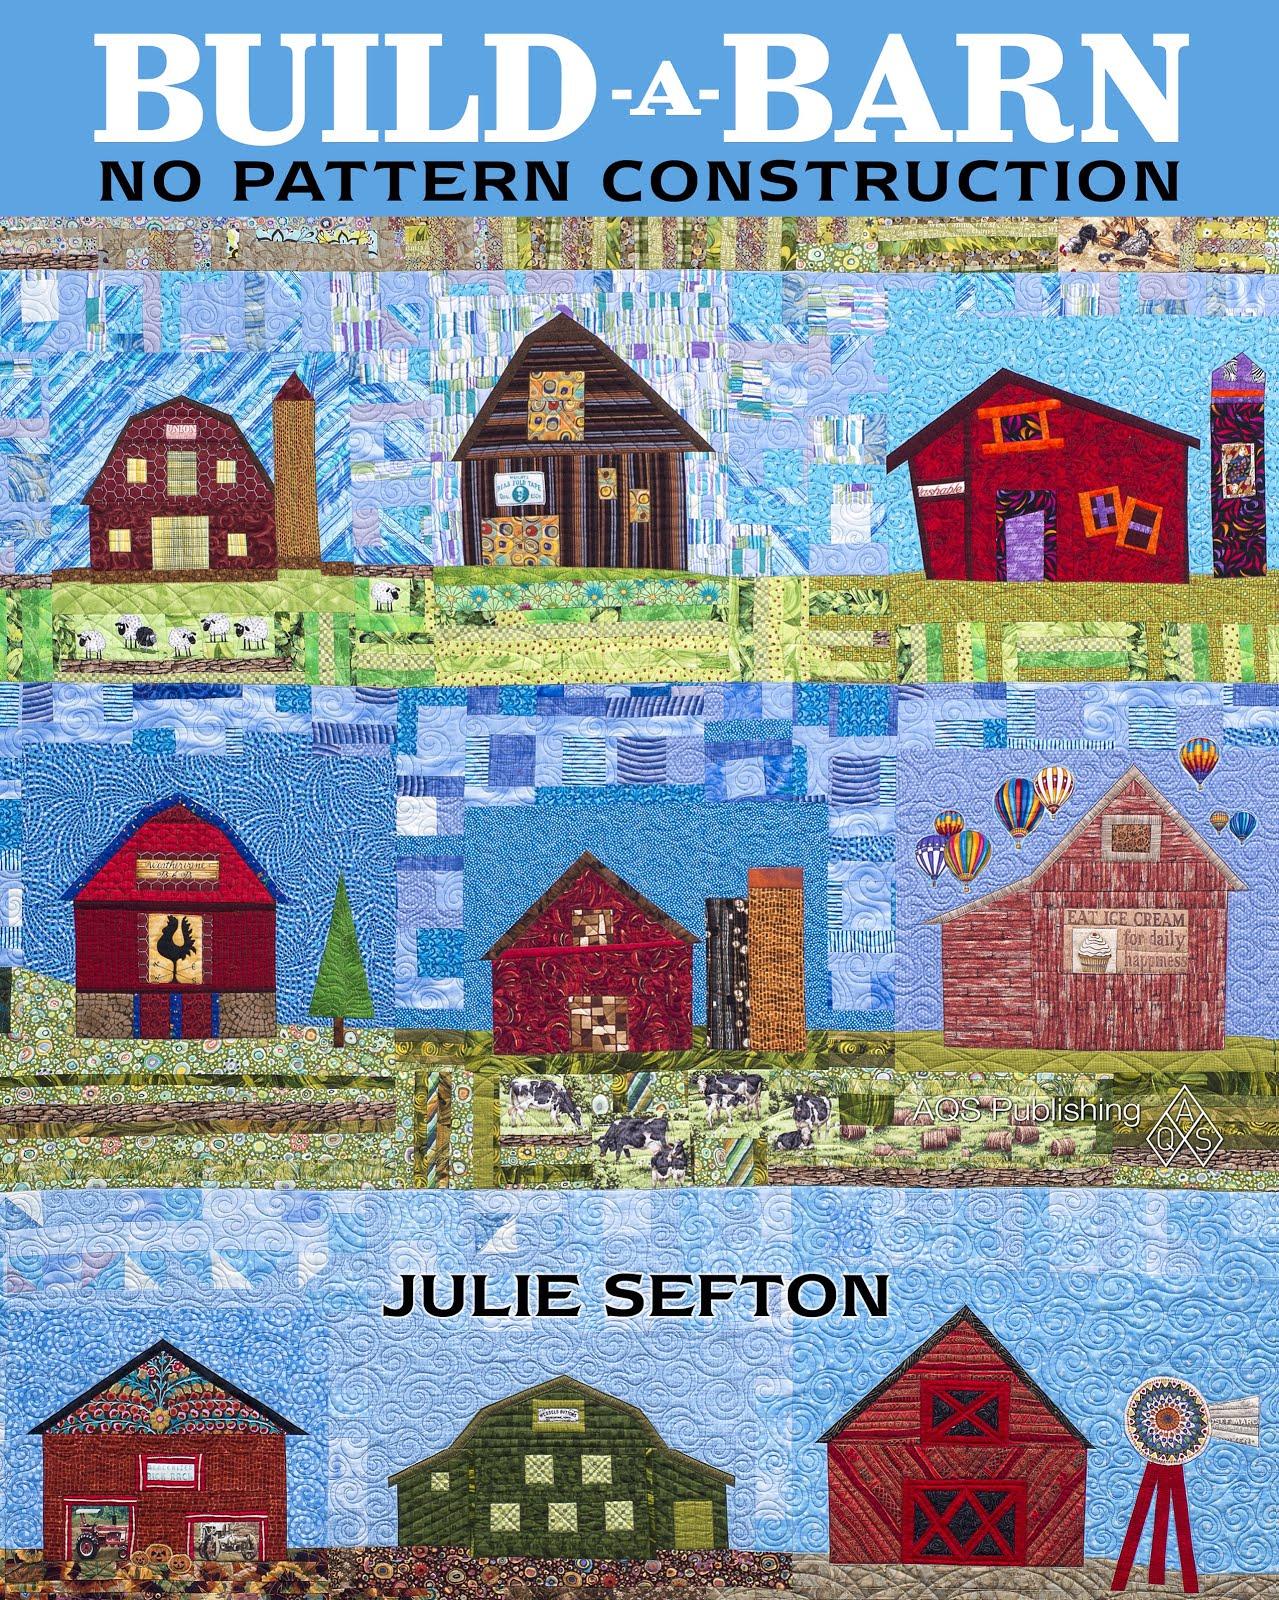 Julie's book